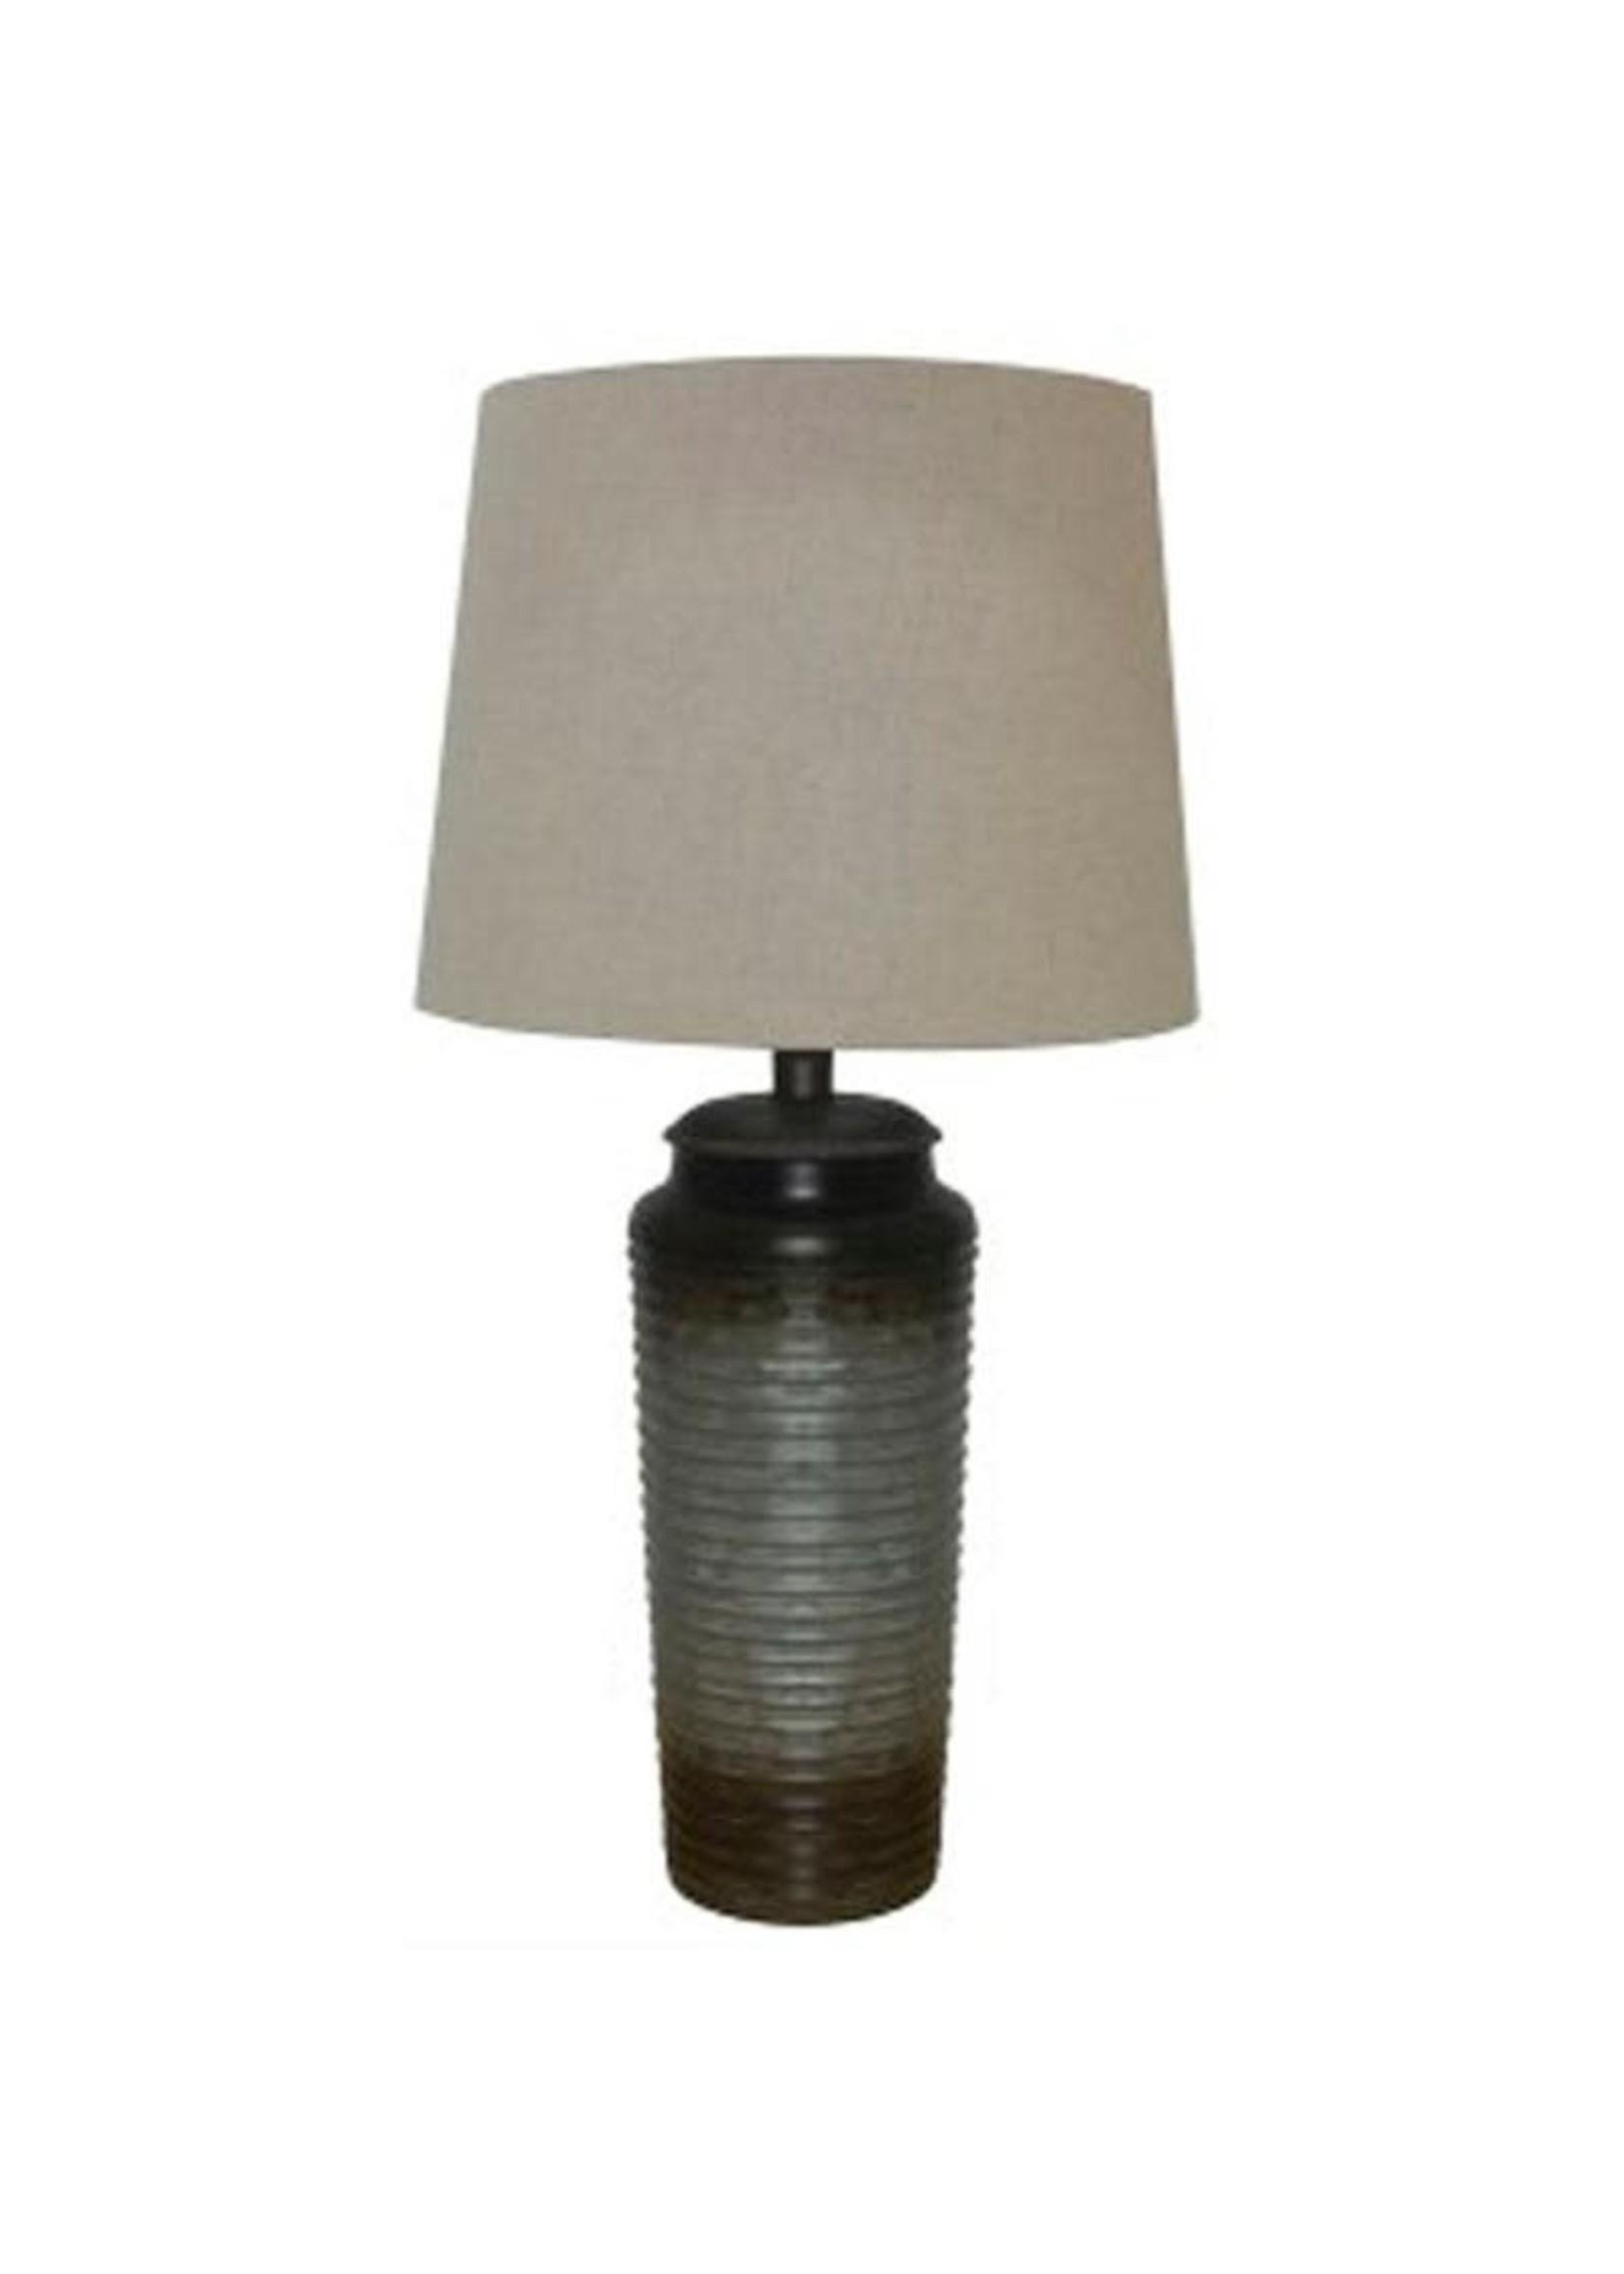 ASHLEY NORBERT METAL TABLE LAMP GREY